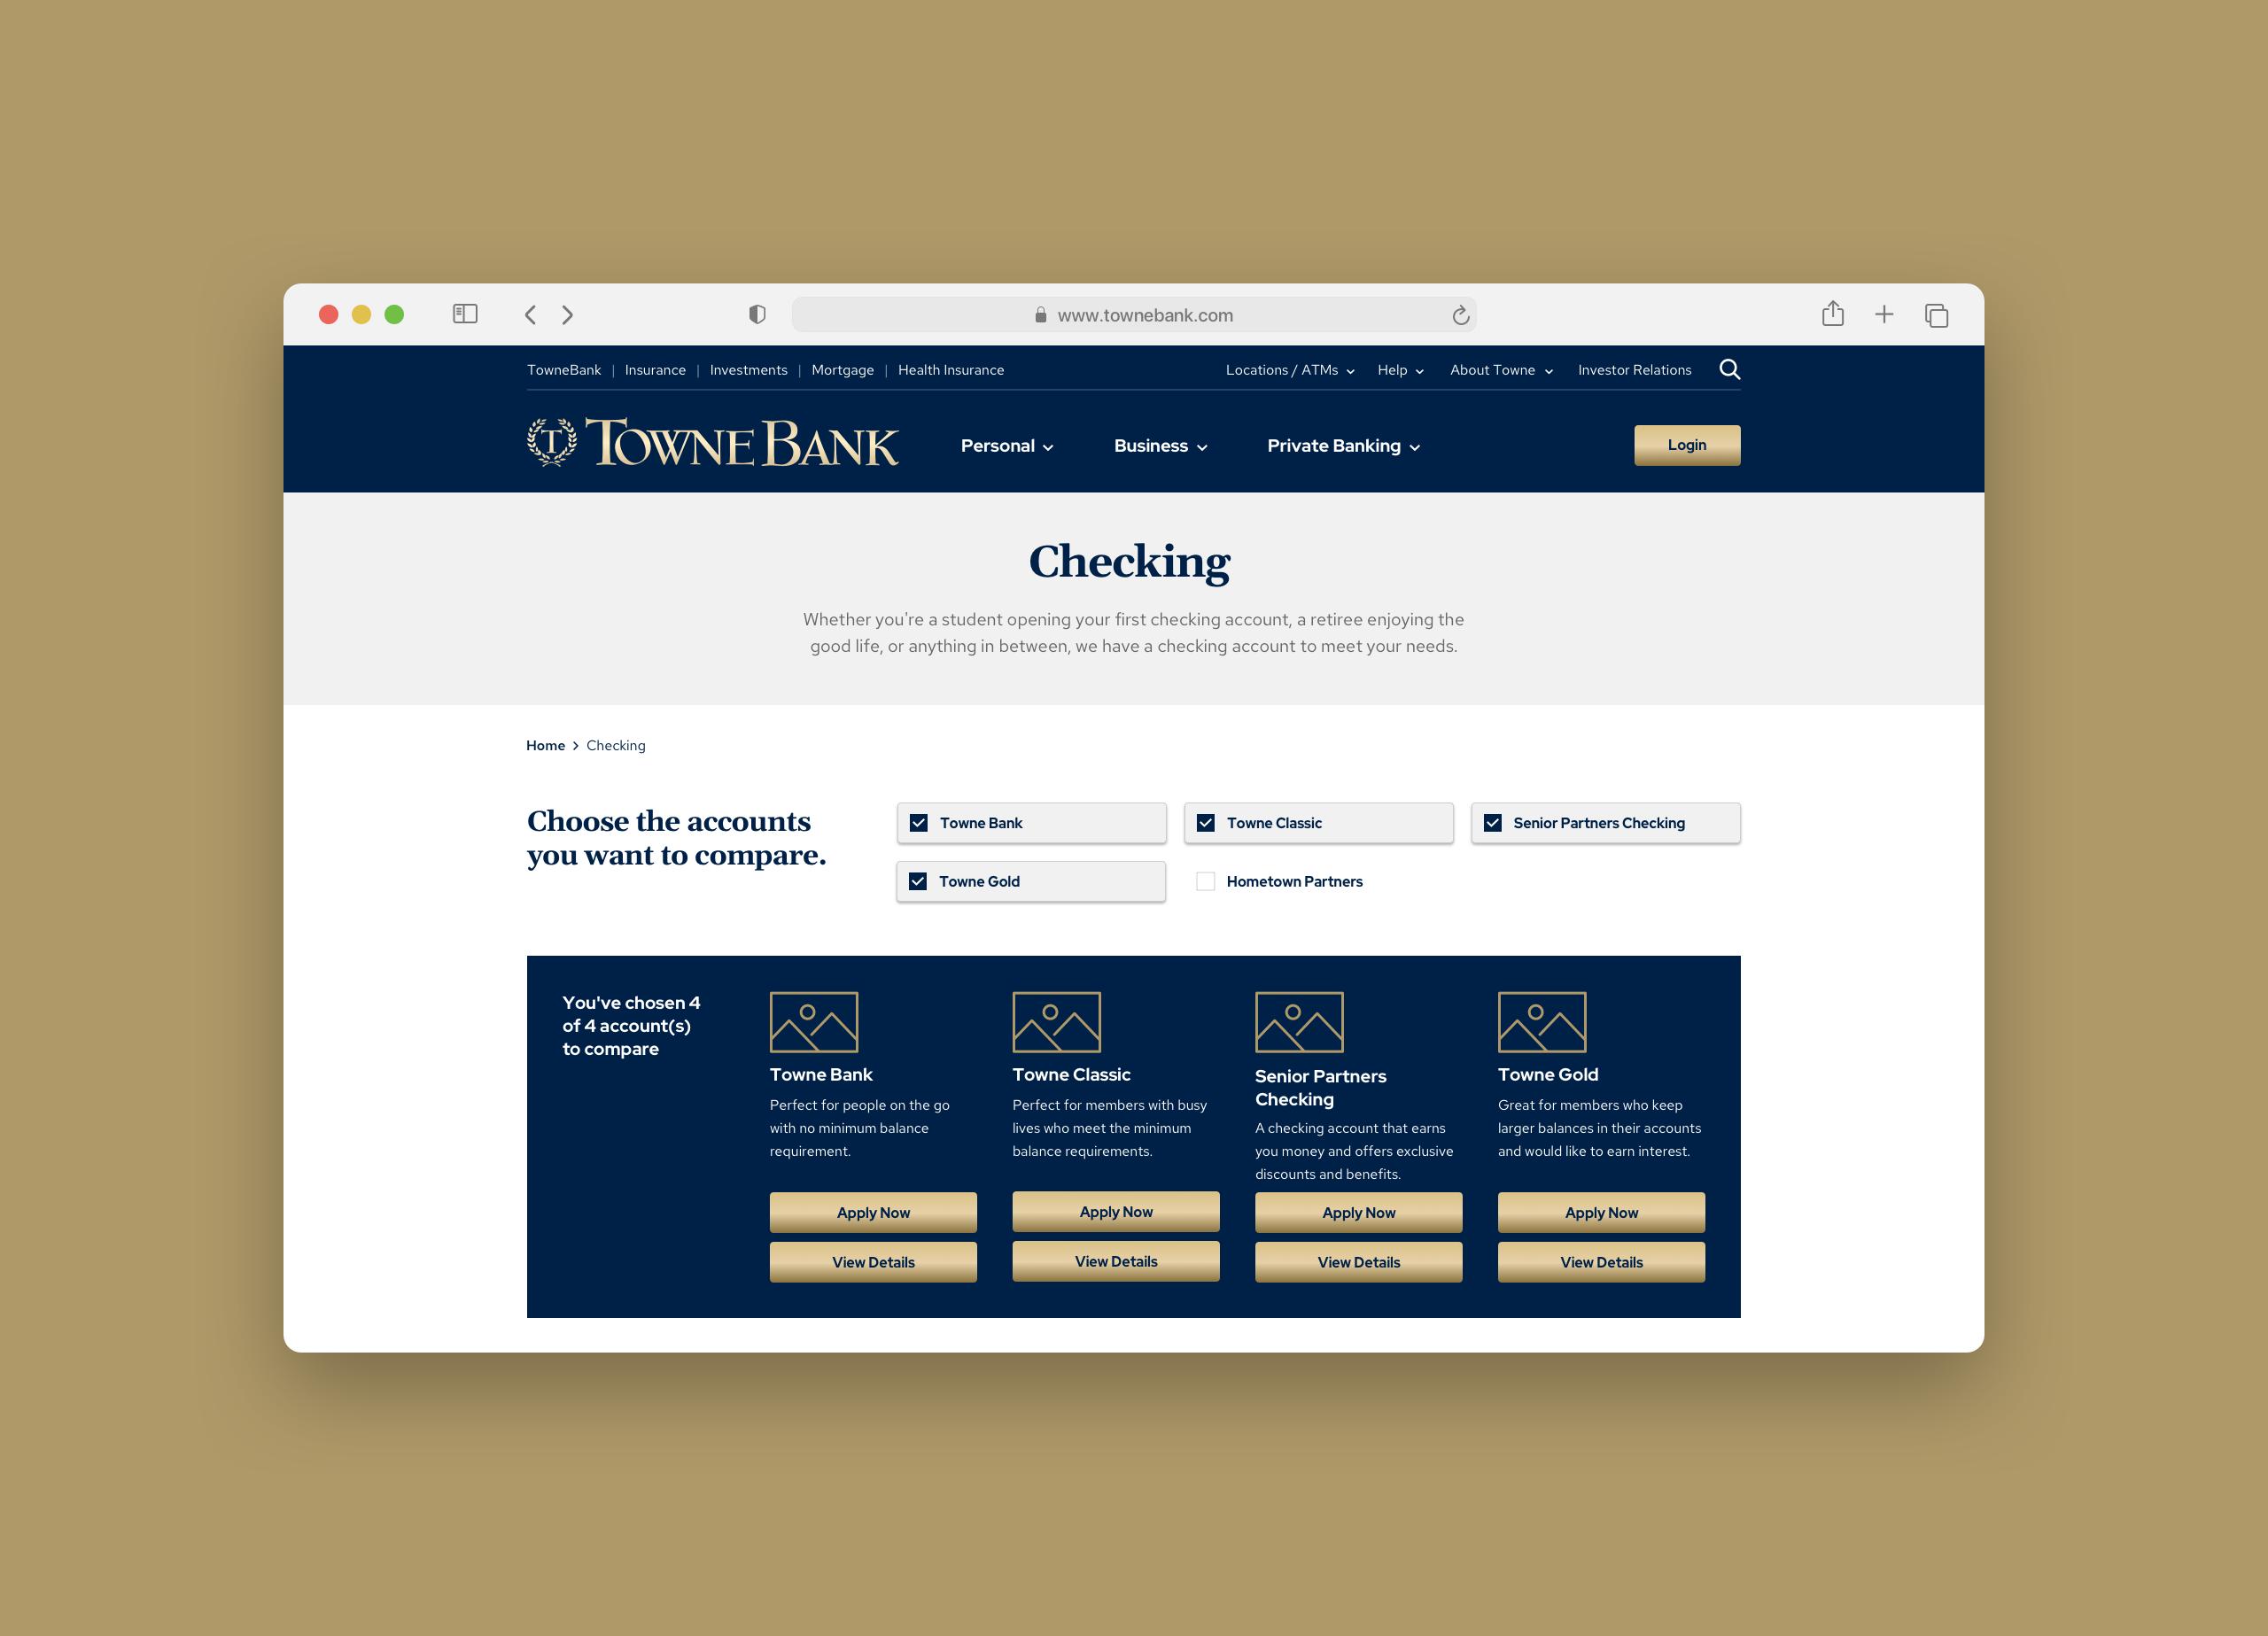 TowneBank Product Comparison Zoom